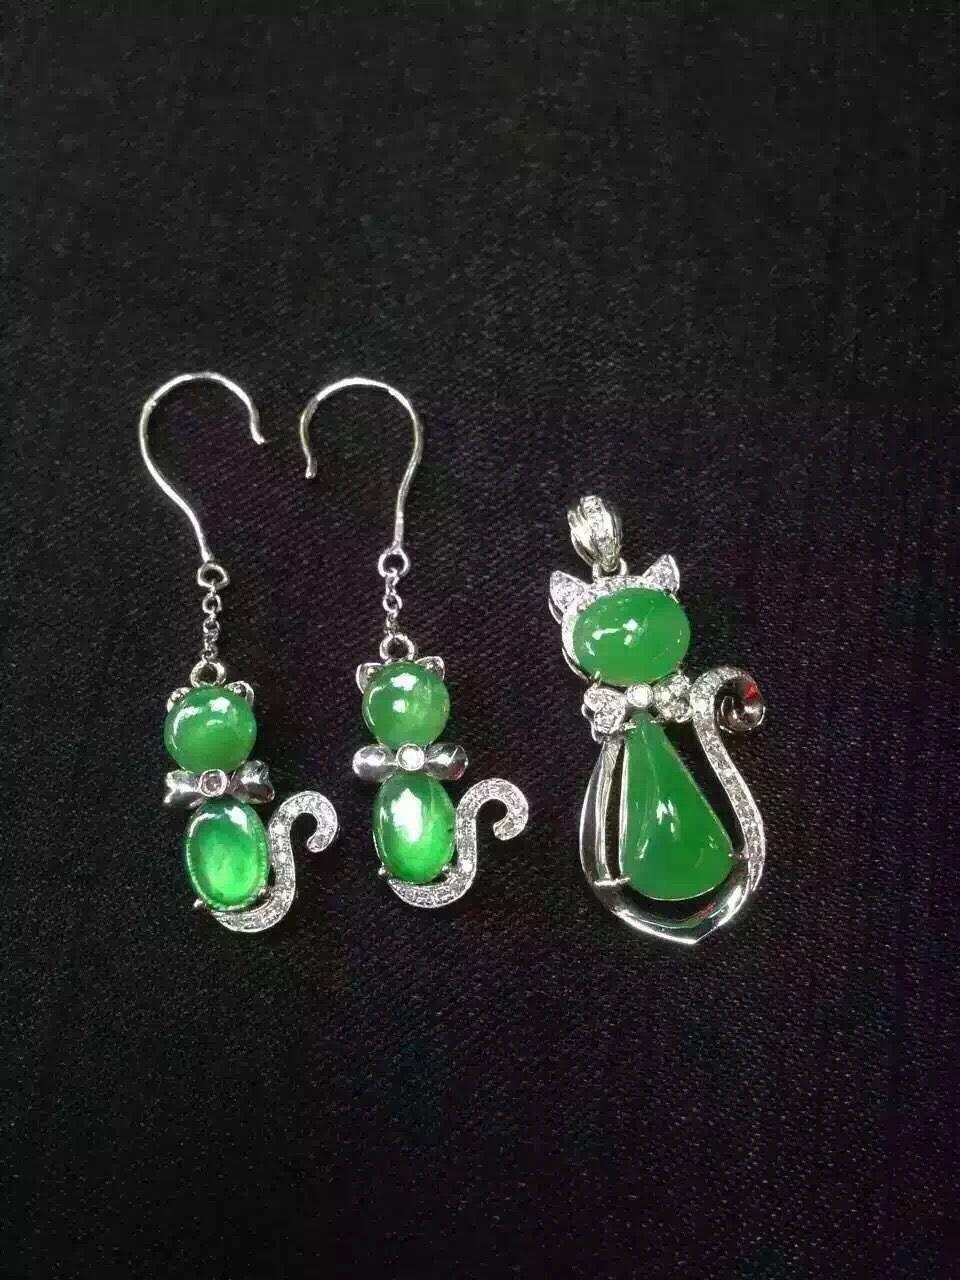 Beautiful water green cat earring and pendant jade jewelry set ...